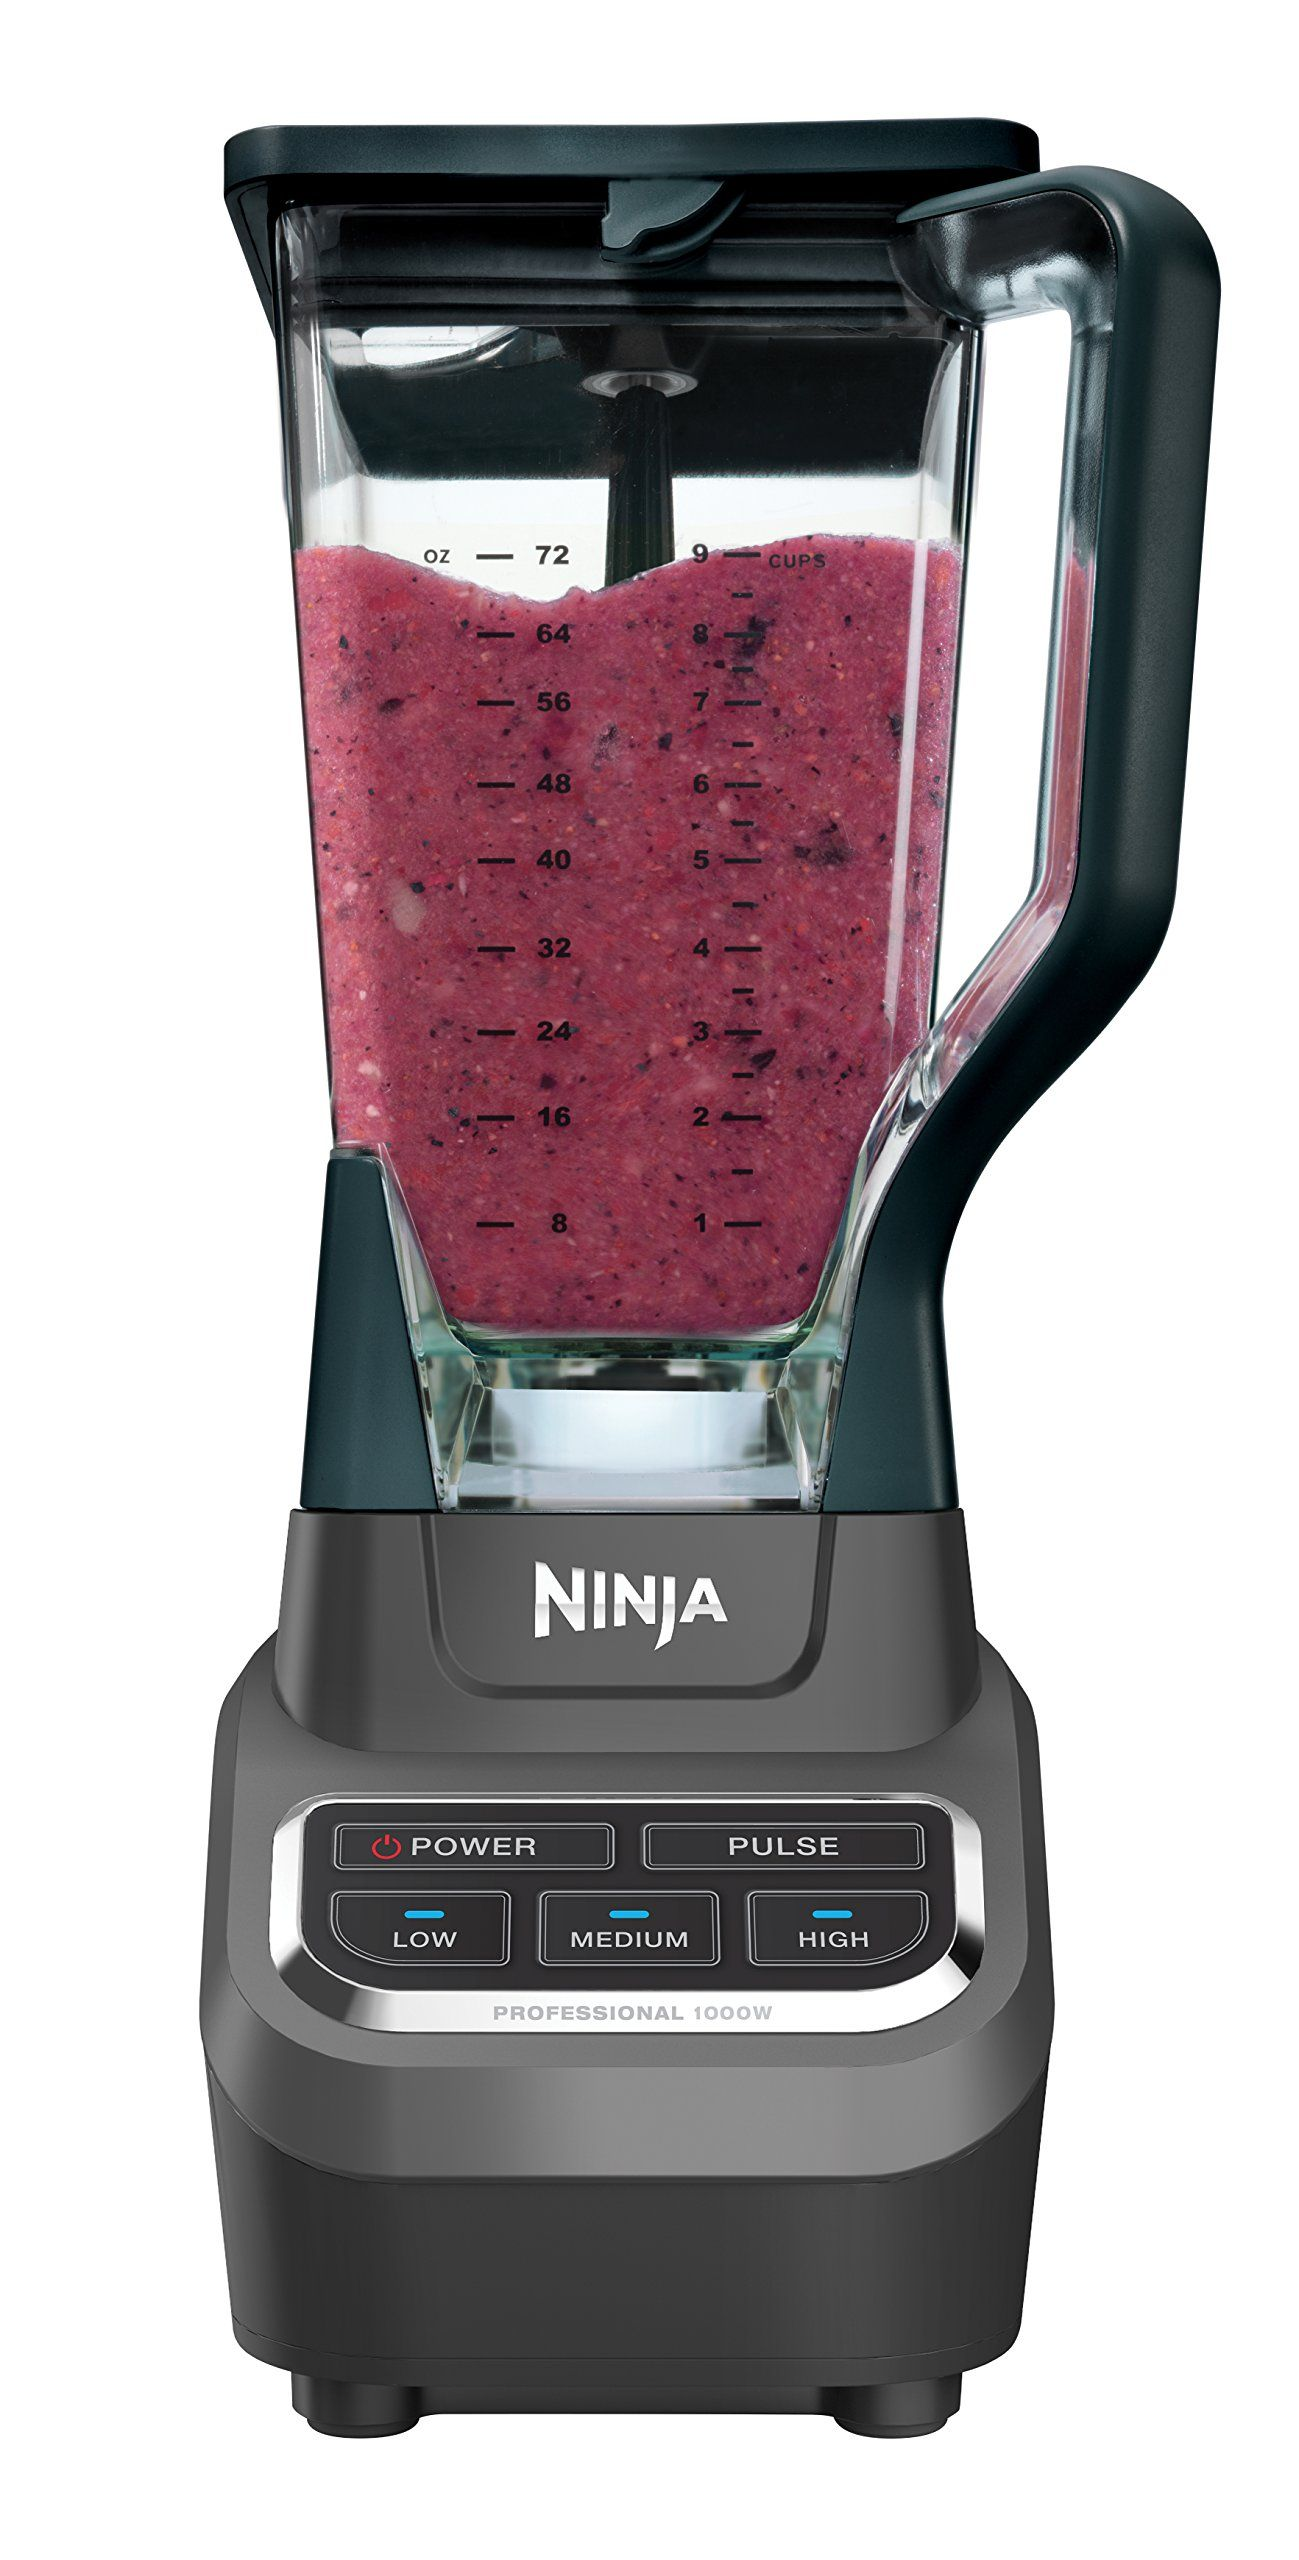 ninja professional blender bl610 read more reviews of the product rh pinterest com